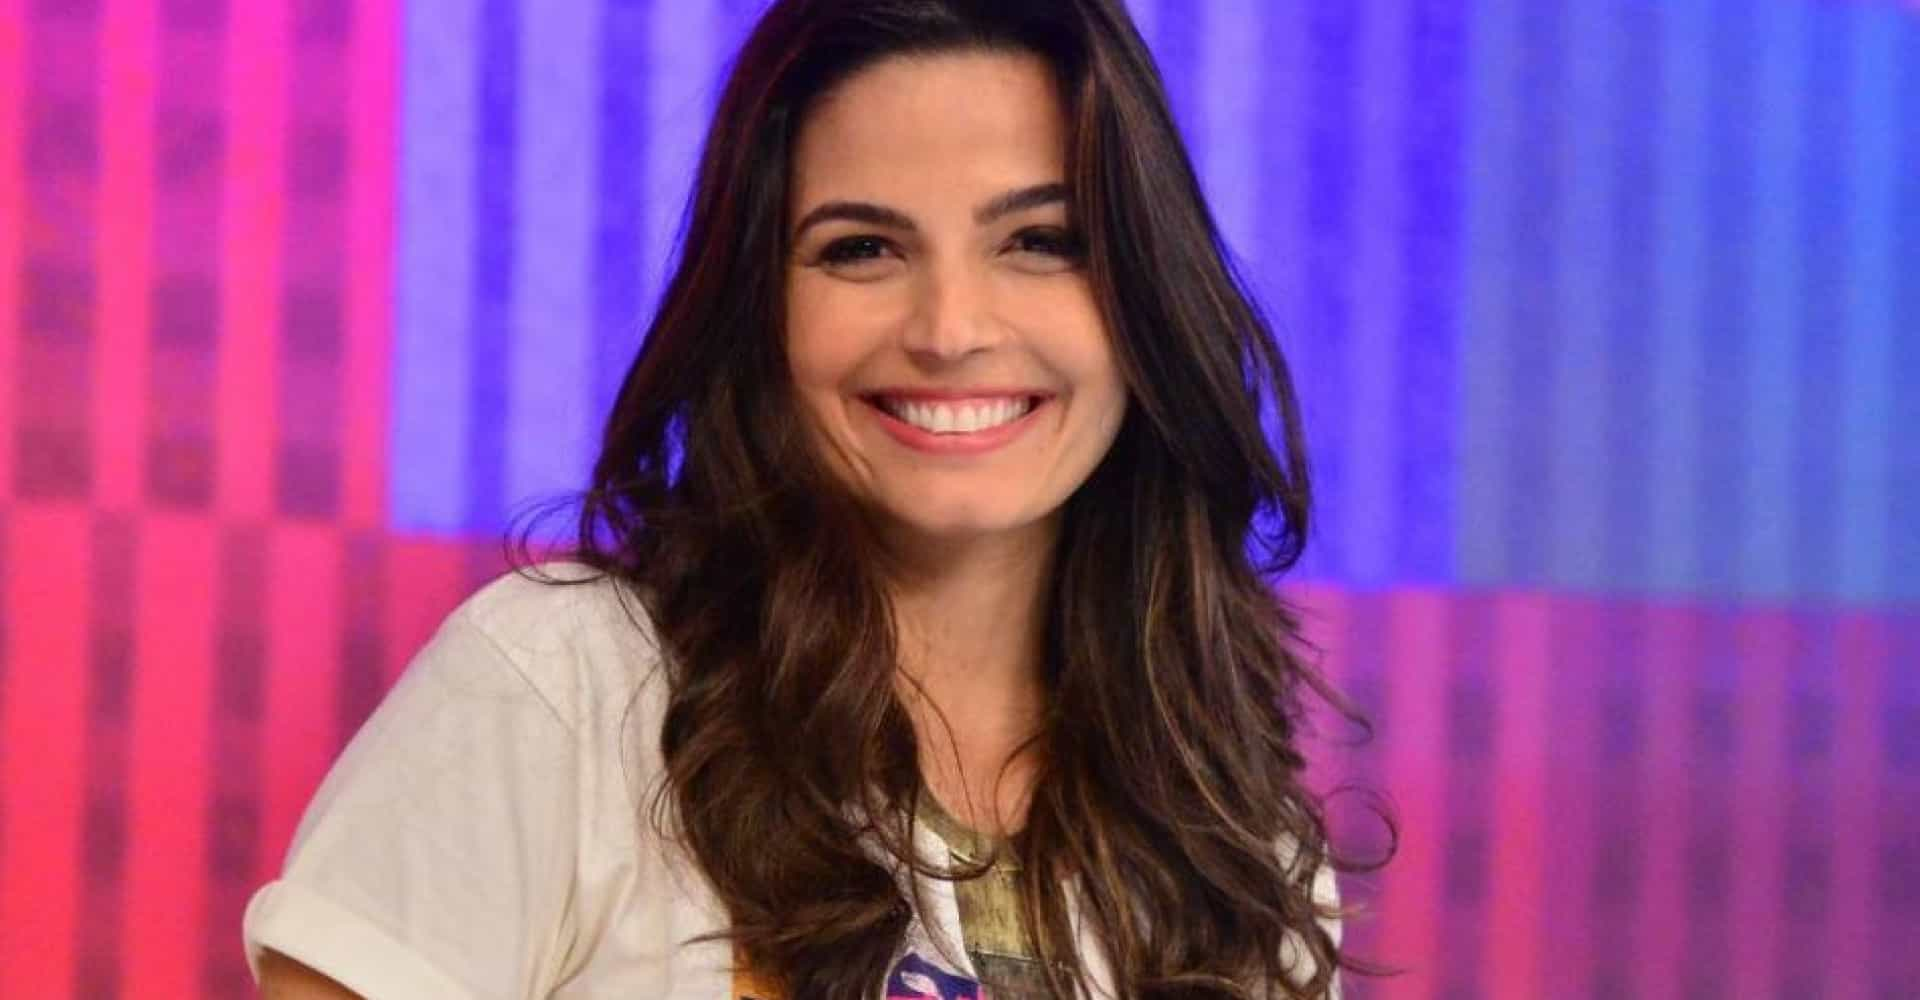 Contratada da Netflix, Emanuelle Araújo é liberada para fazer novela na Globo